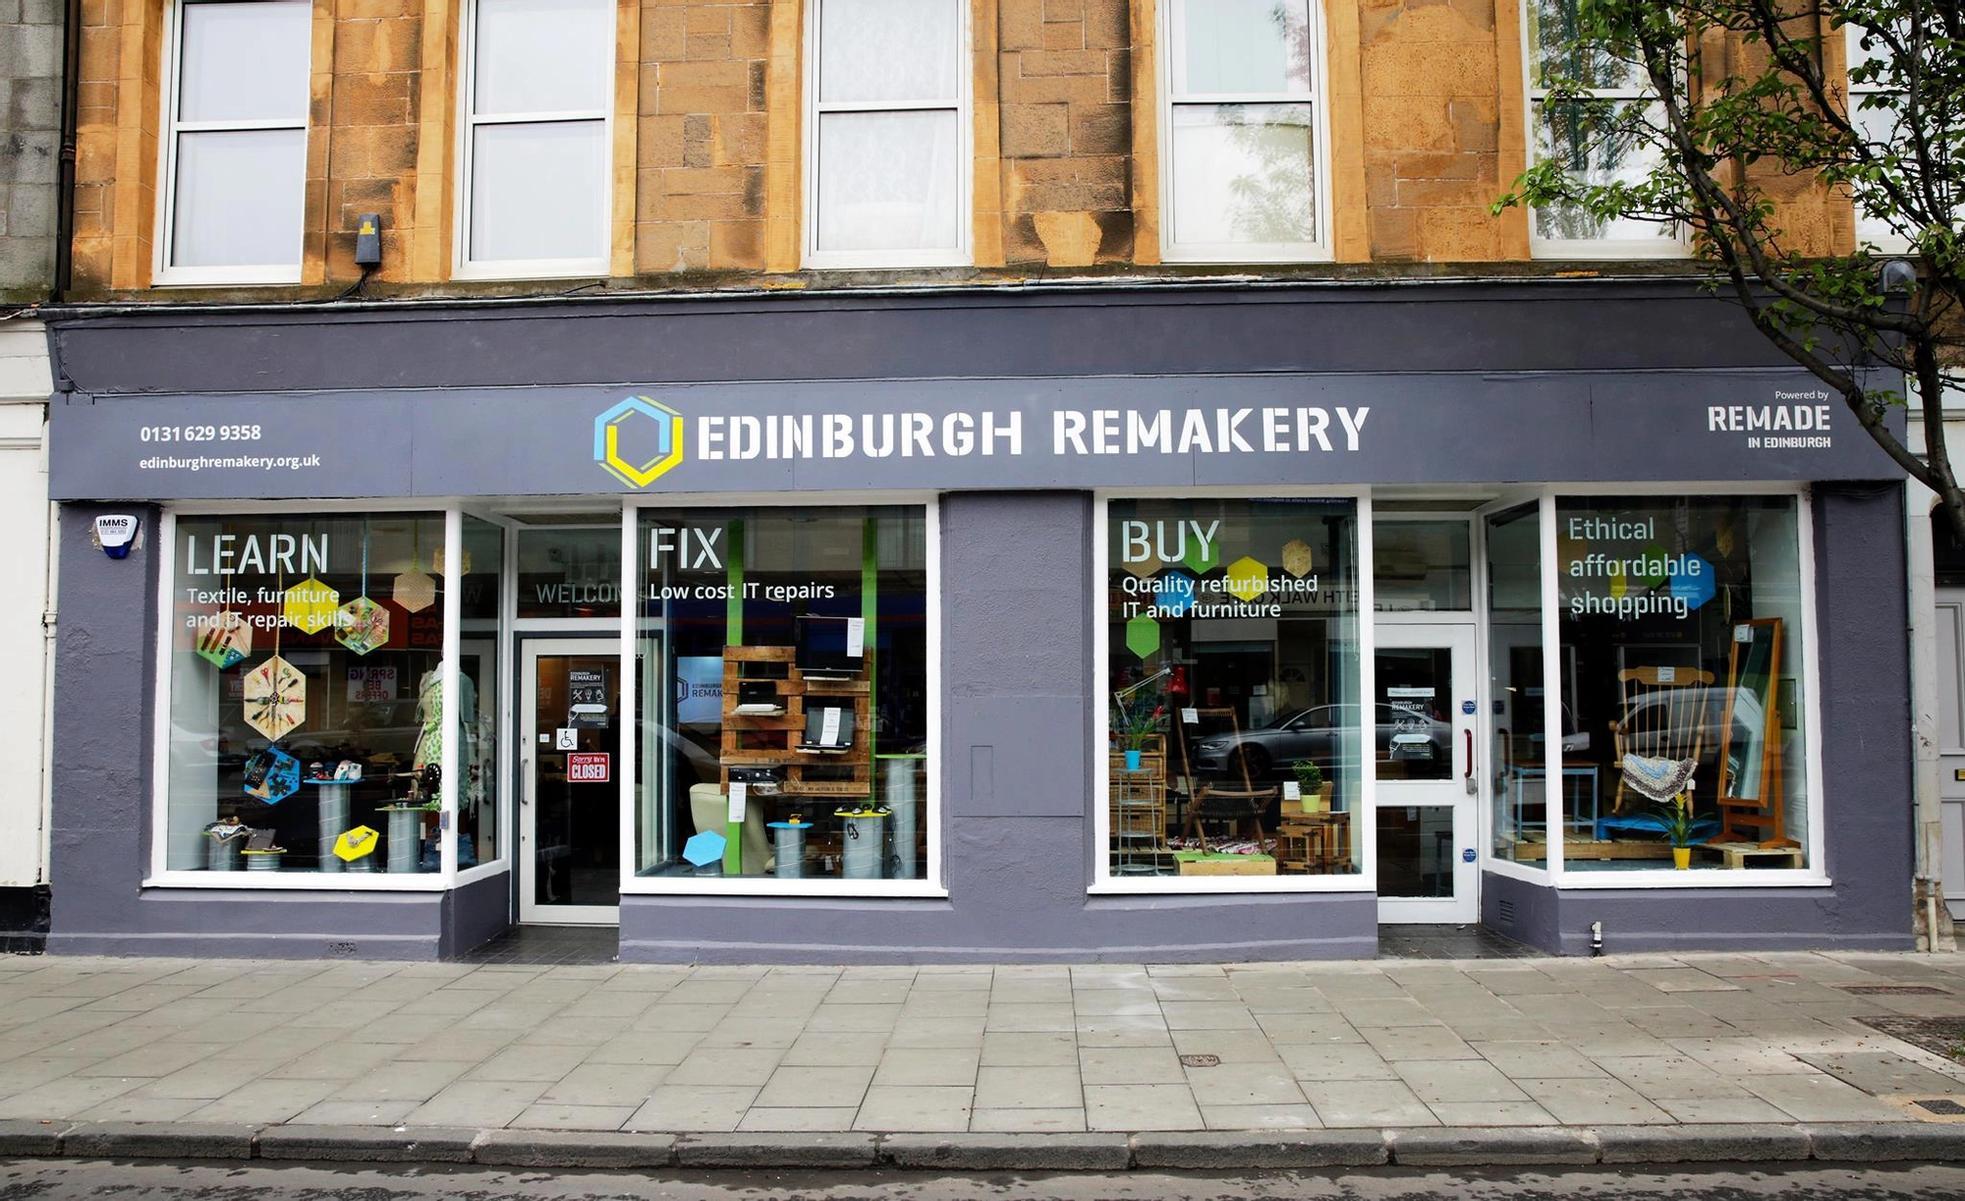 The Edinburgh Remakery